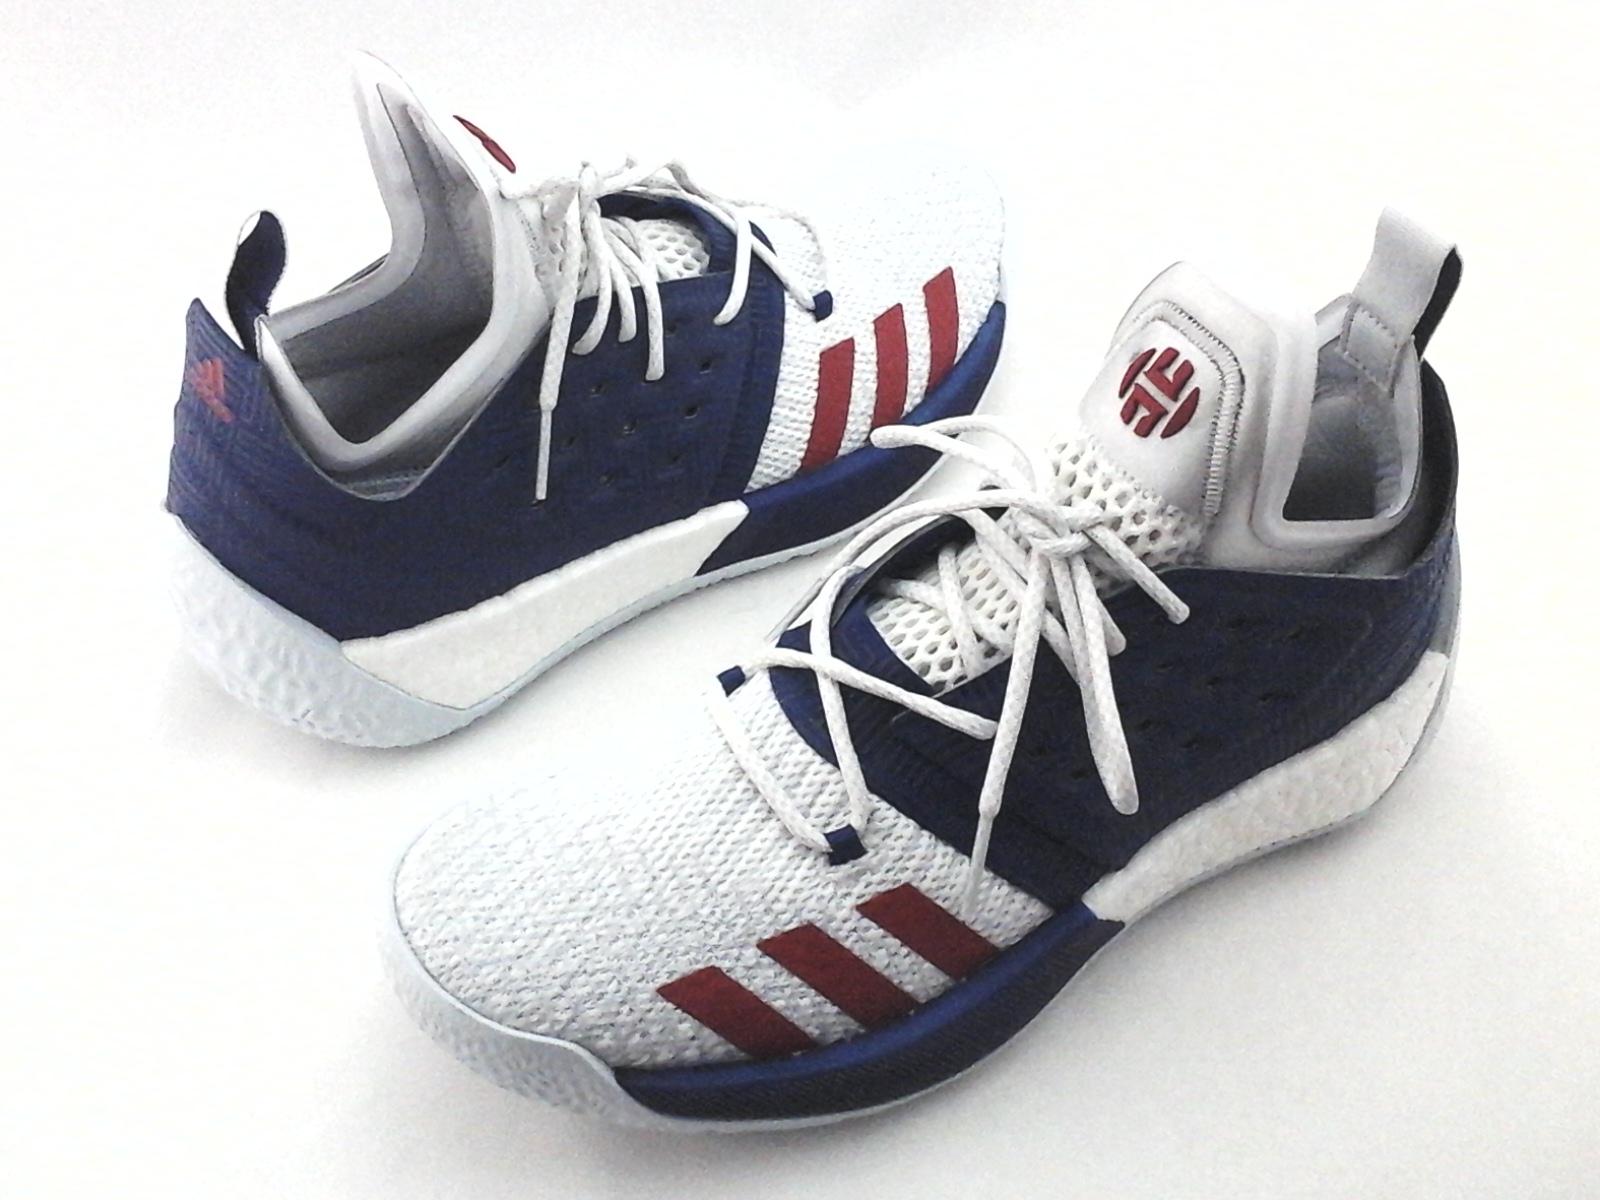 hot sales 92b97 51552 Adidas J. HARDEN Boost Vol. 2 Basketball Shoes AQ0026 Men s US 10.5 44 2 3  New